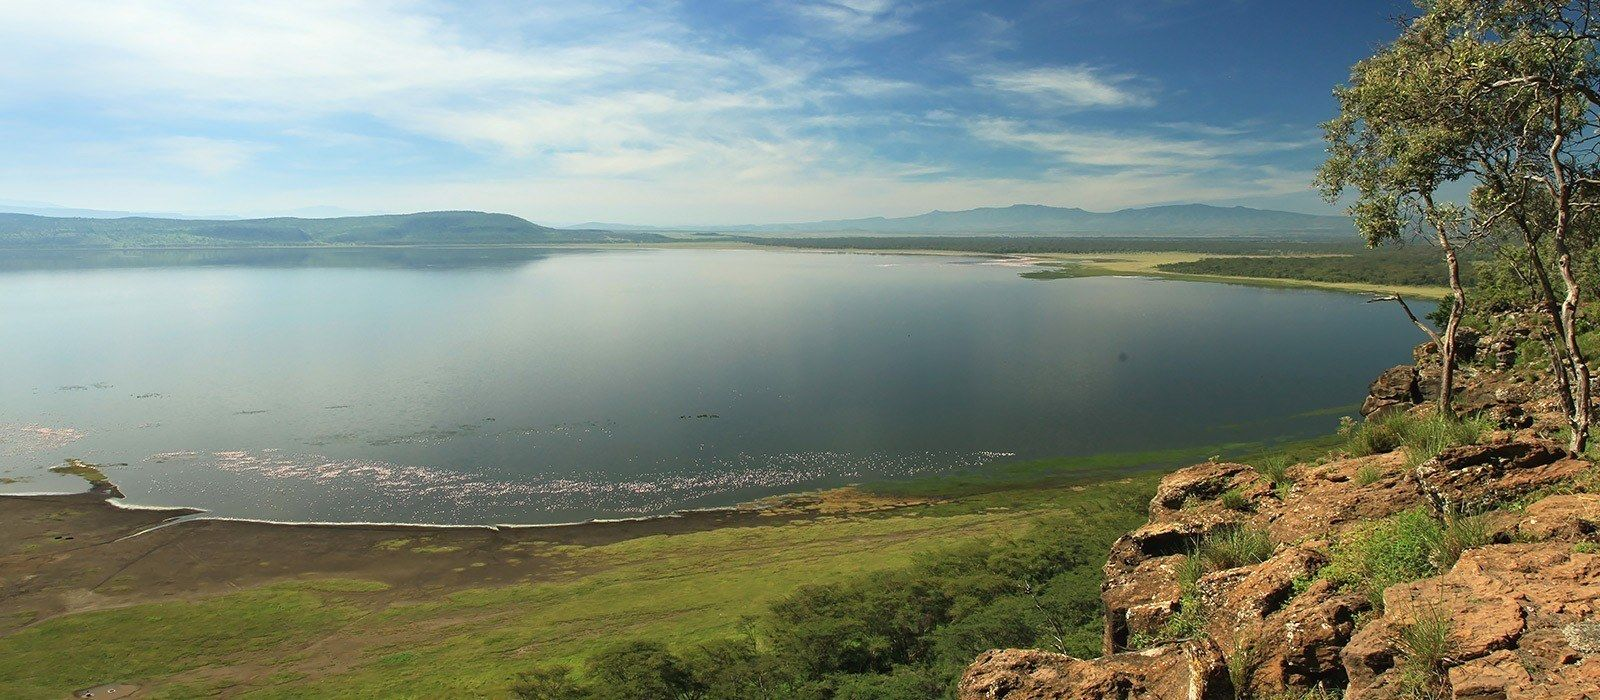 Reiseziel Lake Nakuru Kenia